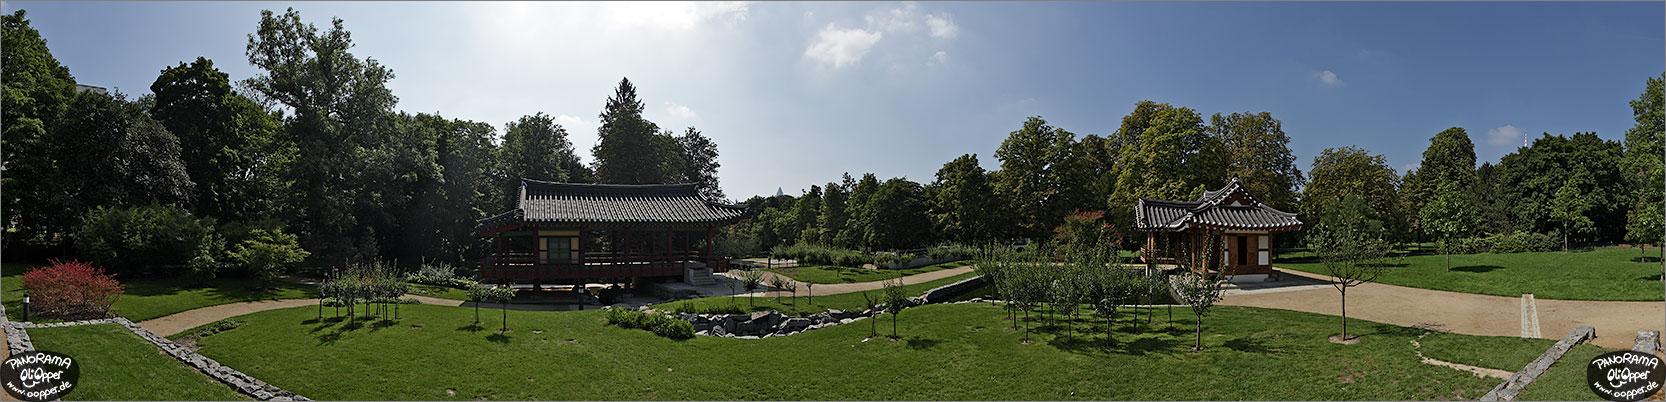 panorama frankfurt am main koreanischer garten im gr neburgpark p1099. Black Bedroom Furniture Sets. Home Design Ideas